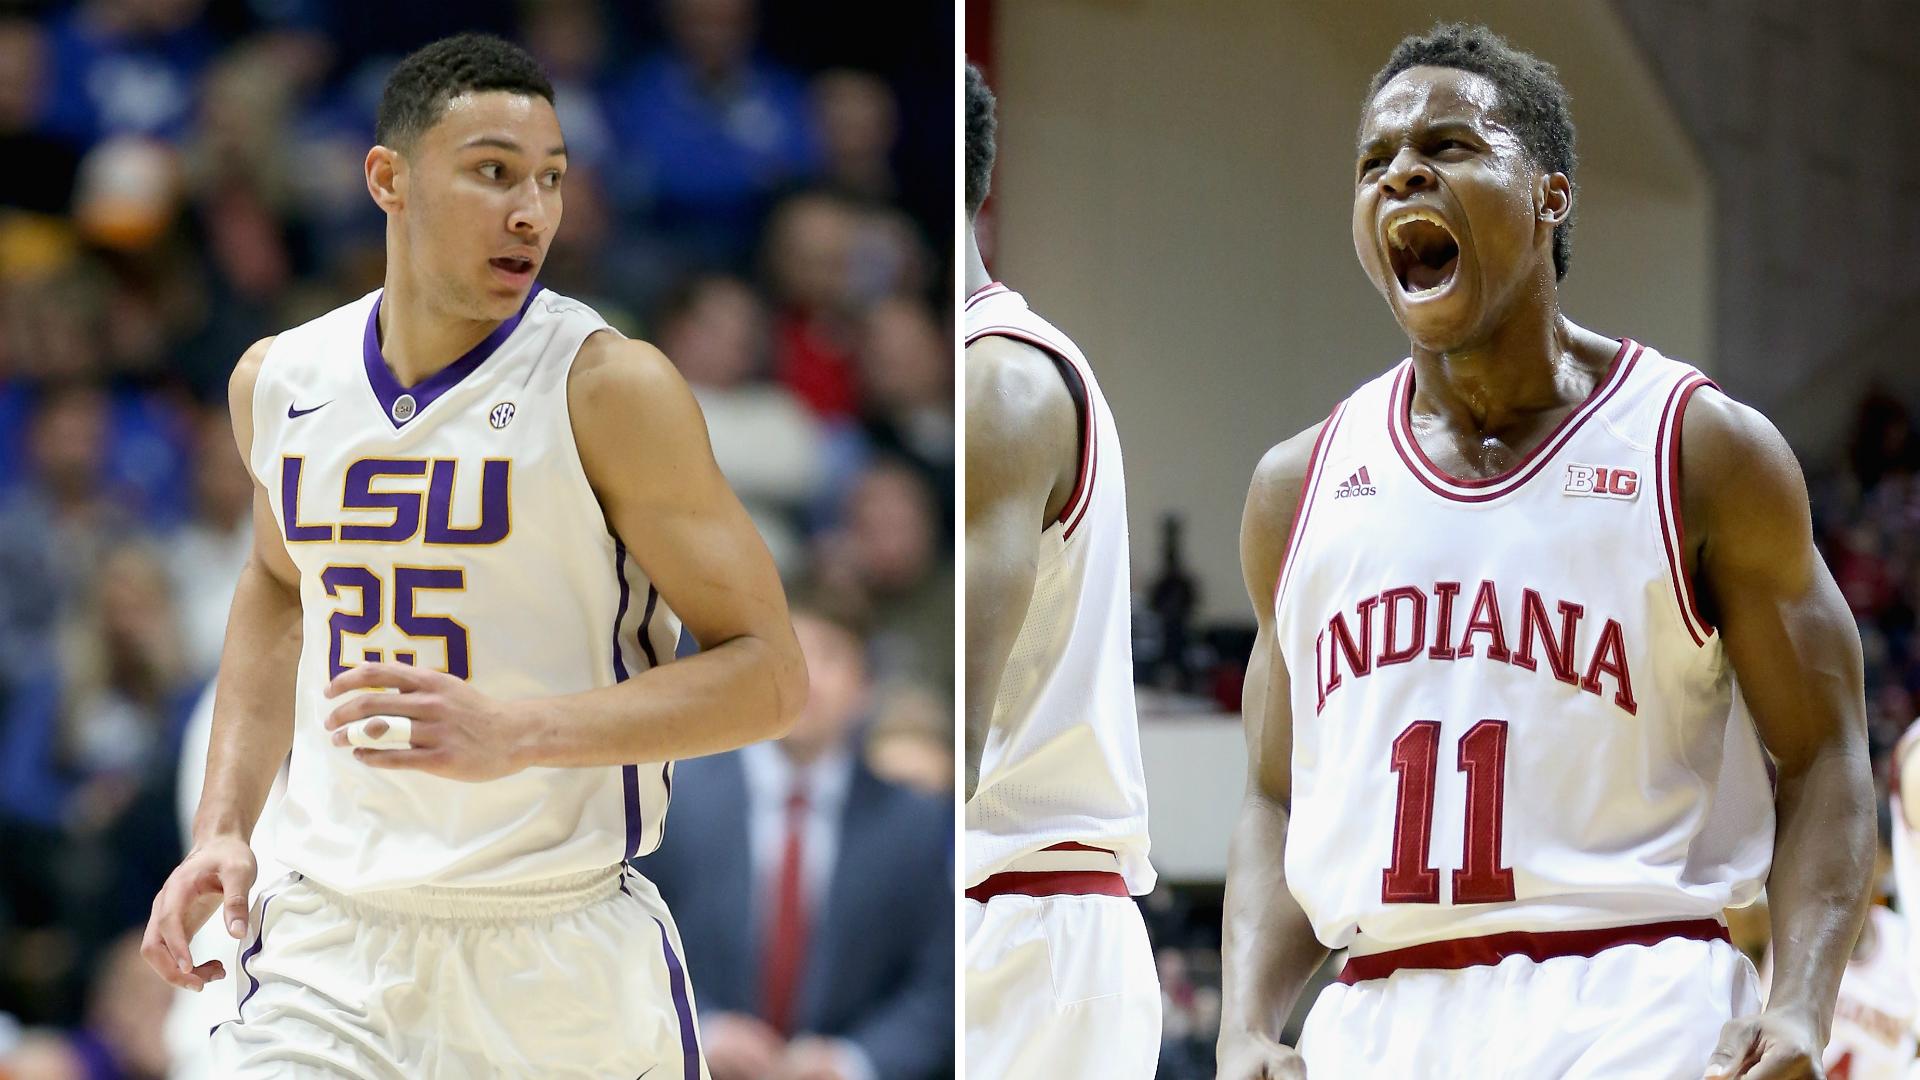 NBA Draft Combine player list: Ben Simmons isn't going, and Yogi Ferrell wasn't invited